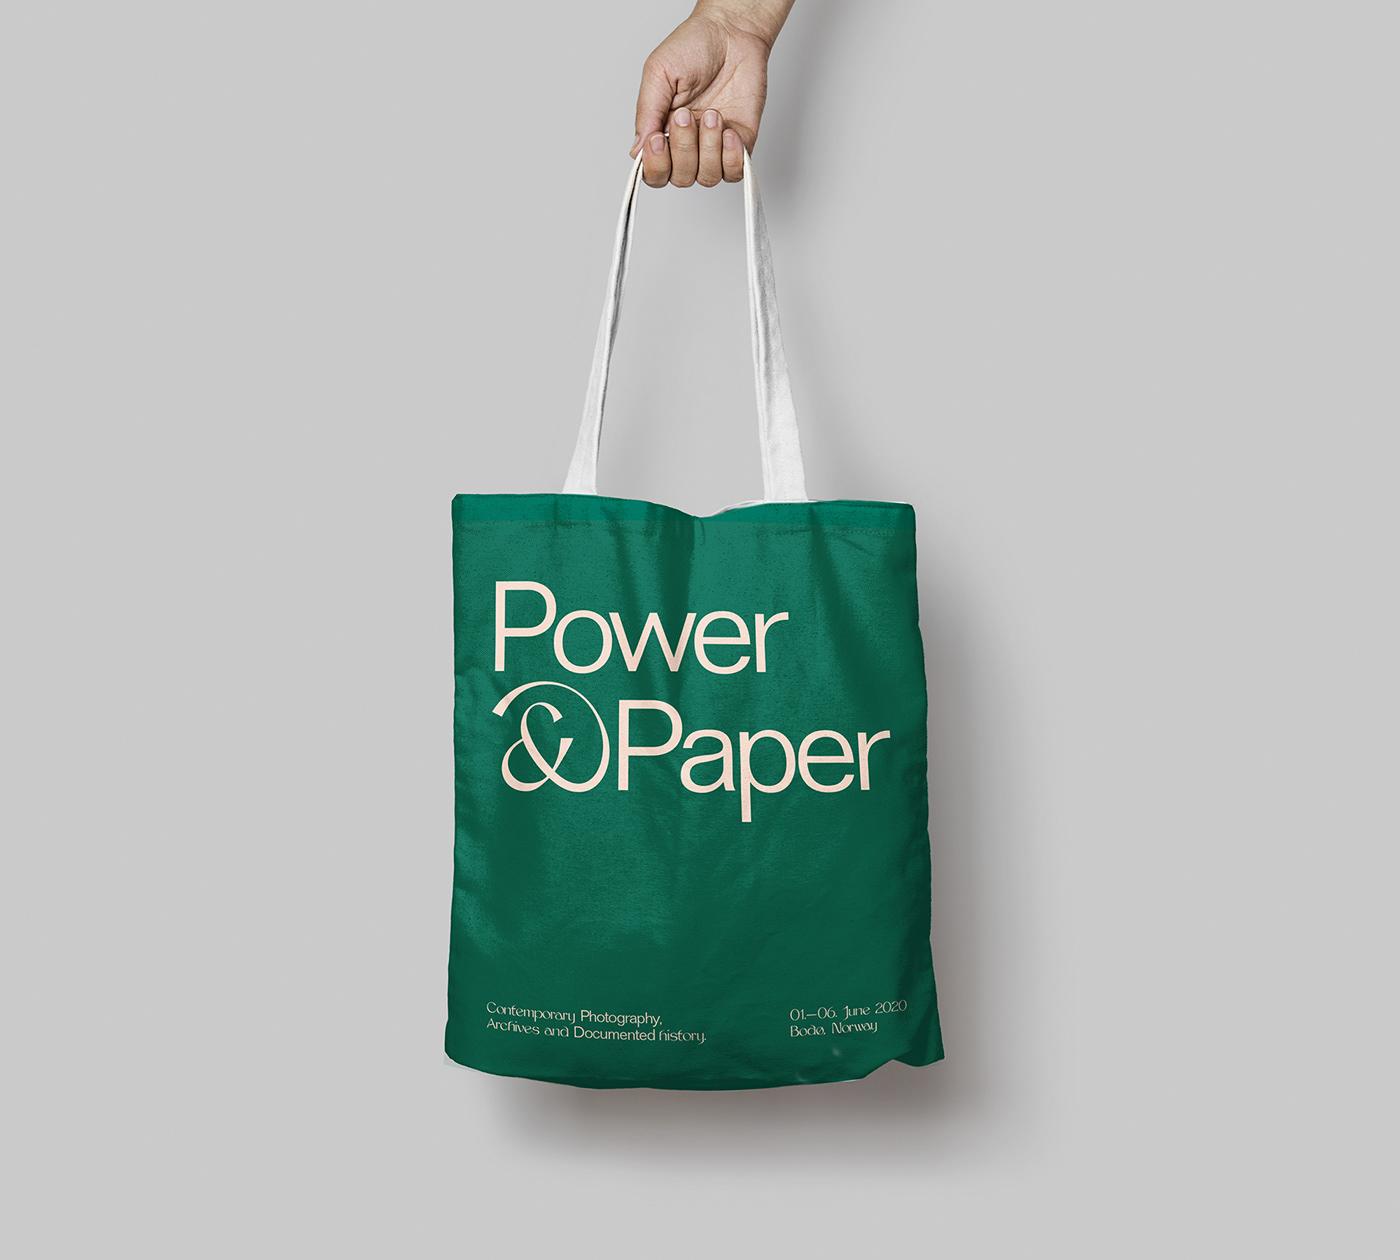 branding  exhibiton graphic design  noua Photography  power&paper SwissDesign typography